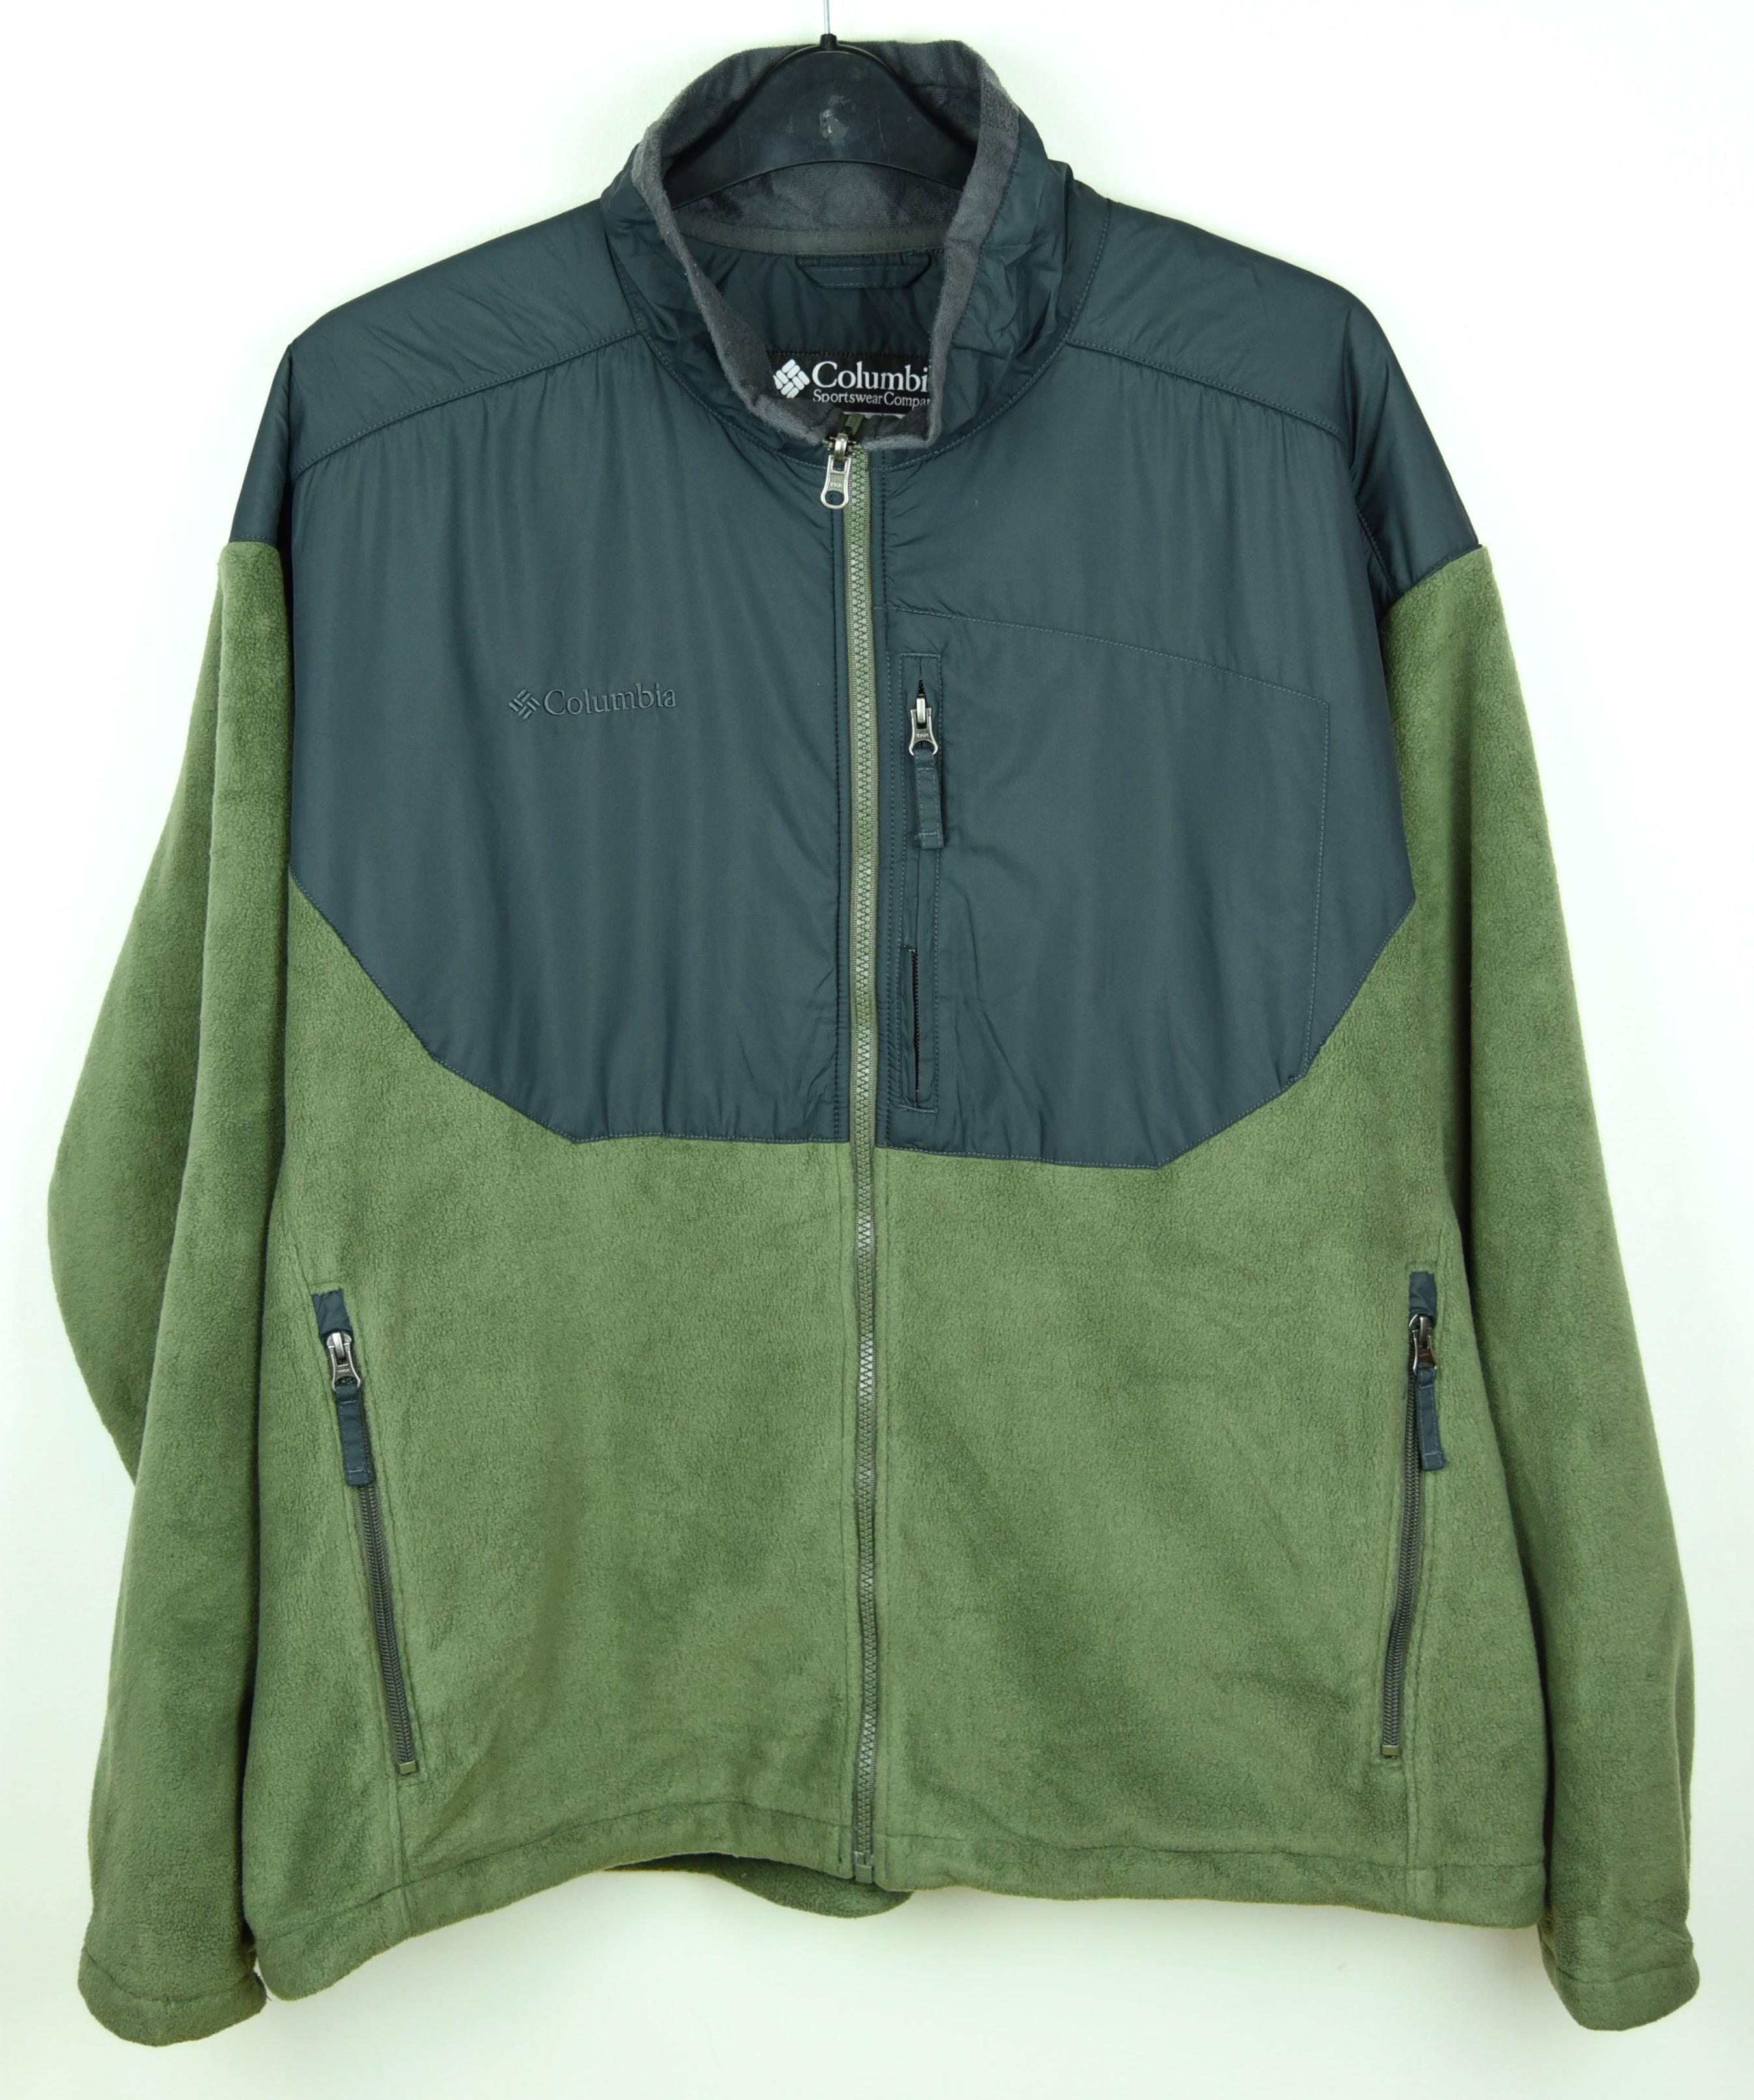 Columbia Core 2XL Fleece mountable to Jacket Jumper Sweater